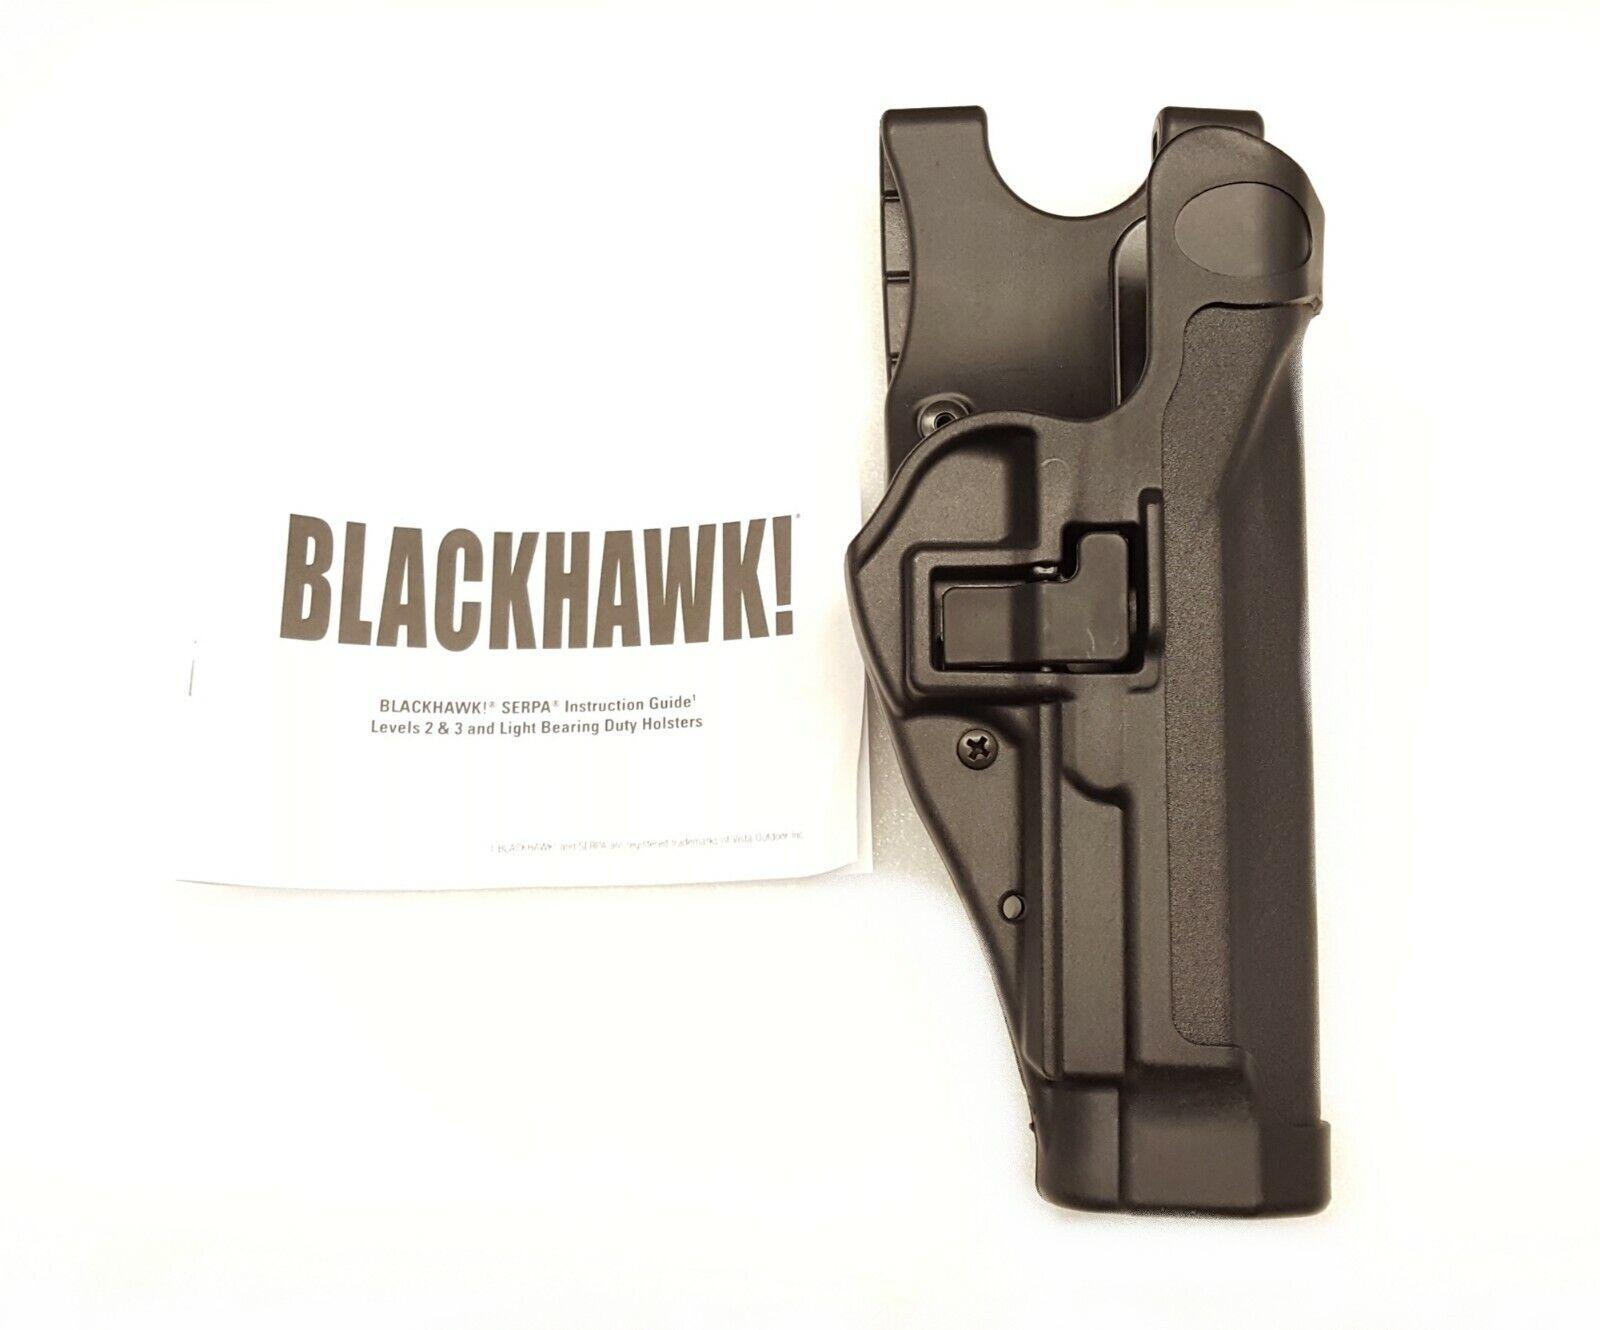 Blackhawk Serpa Level 2 Duty Holster 44H004BK-R NEW